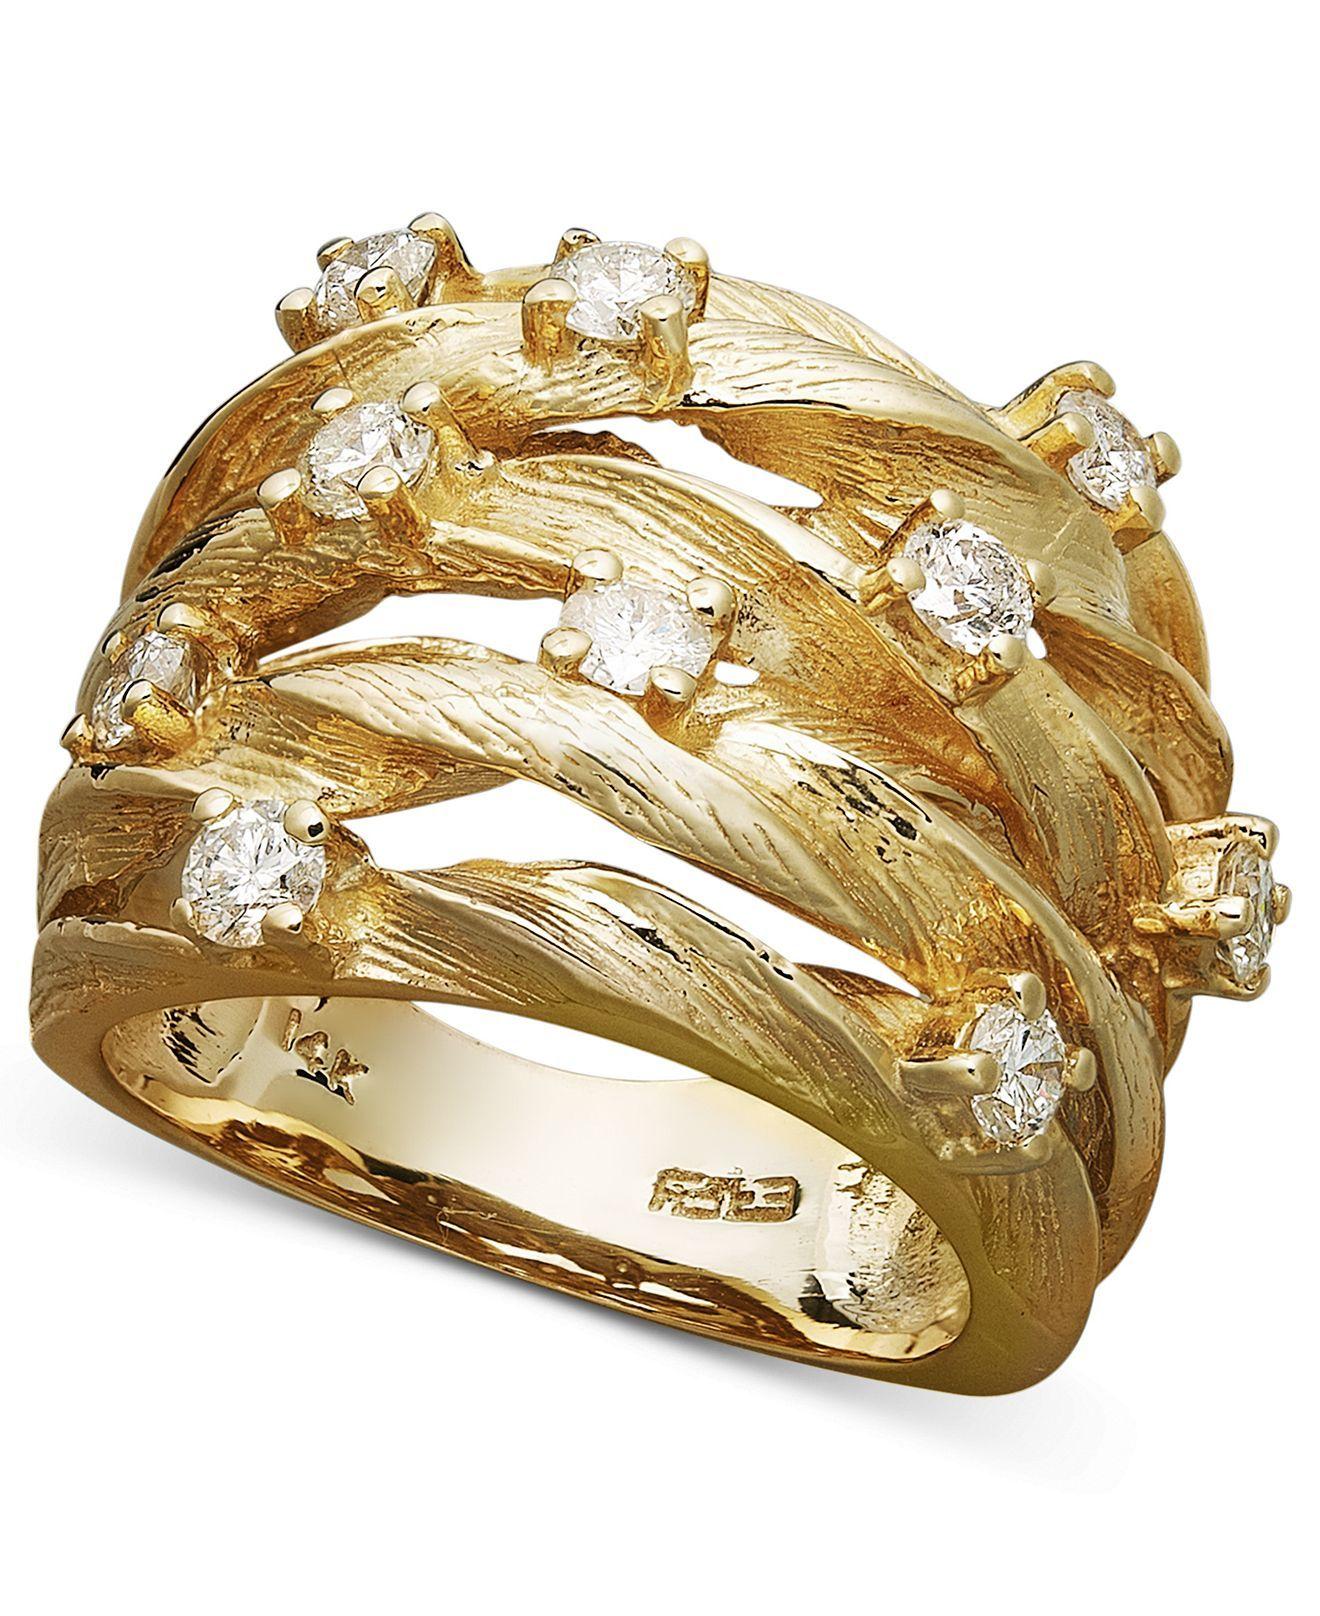 Doro by effy diamond woven ring 1 ct tw in 14k